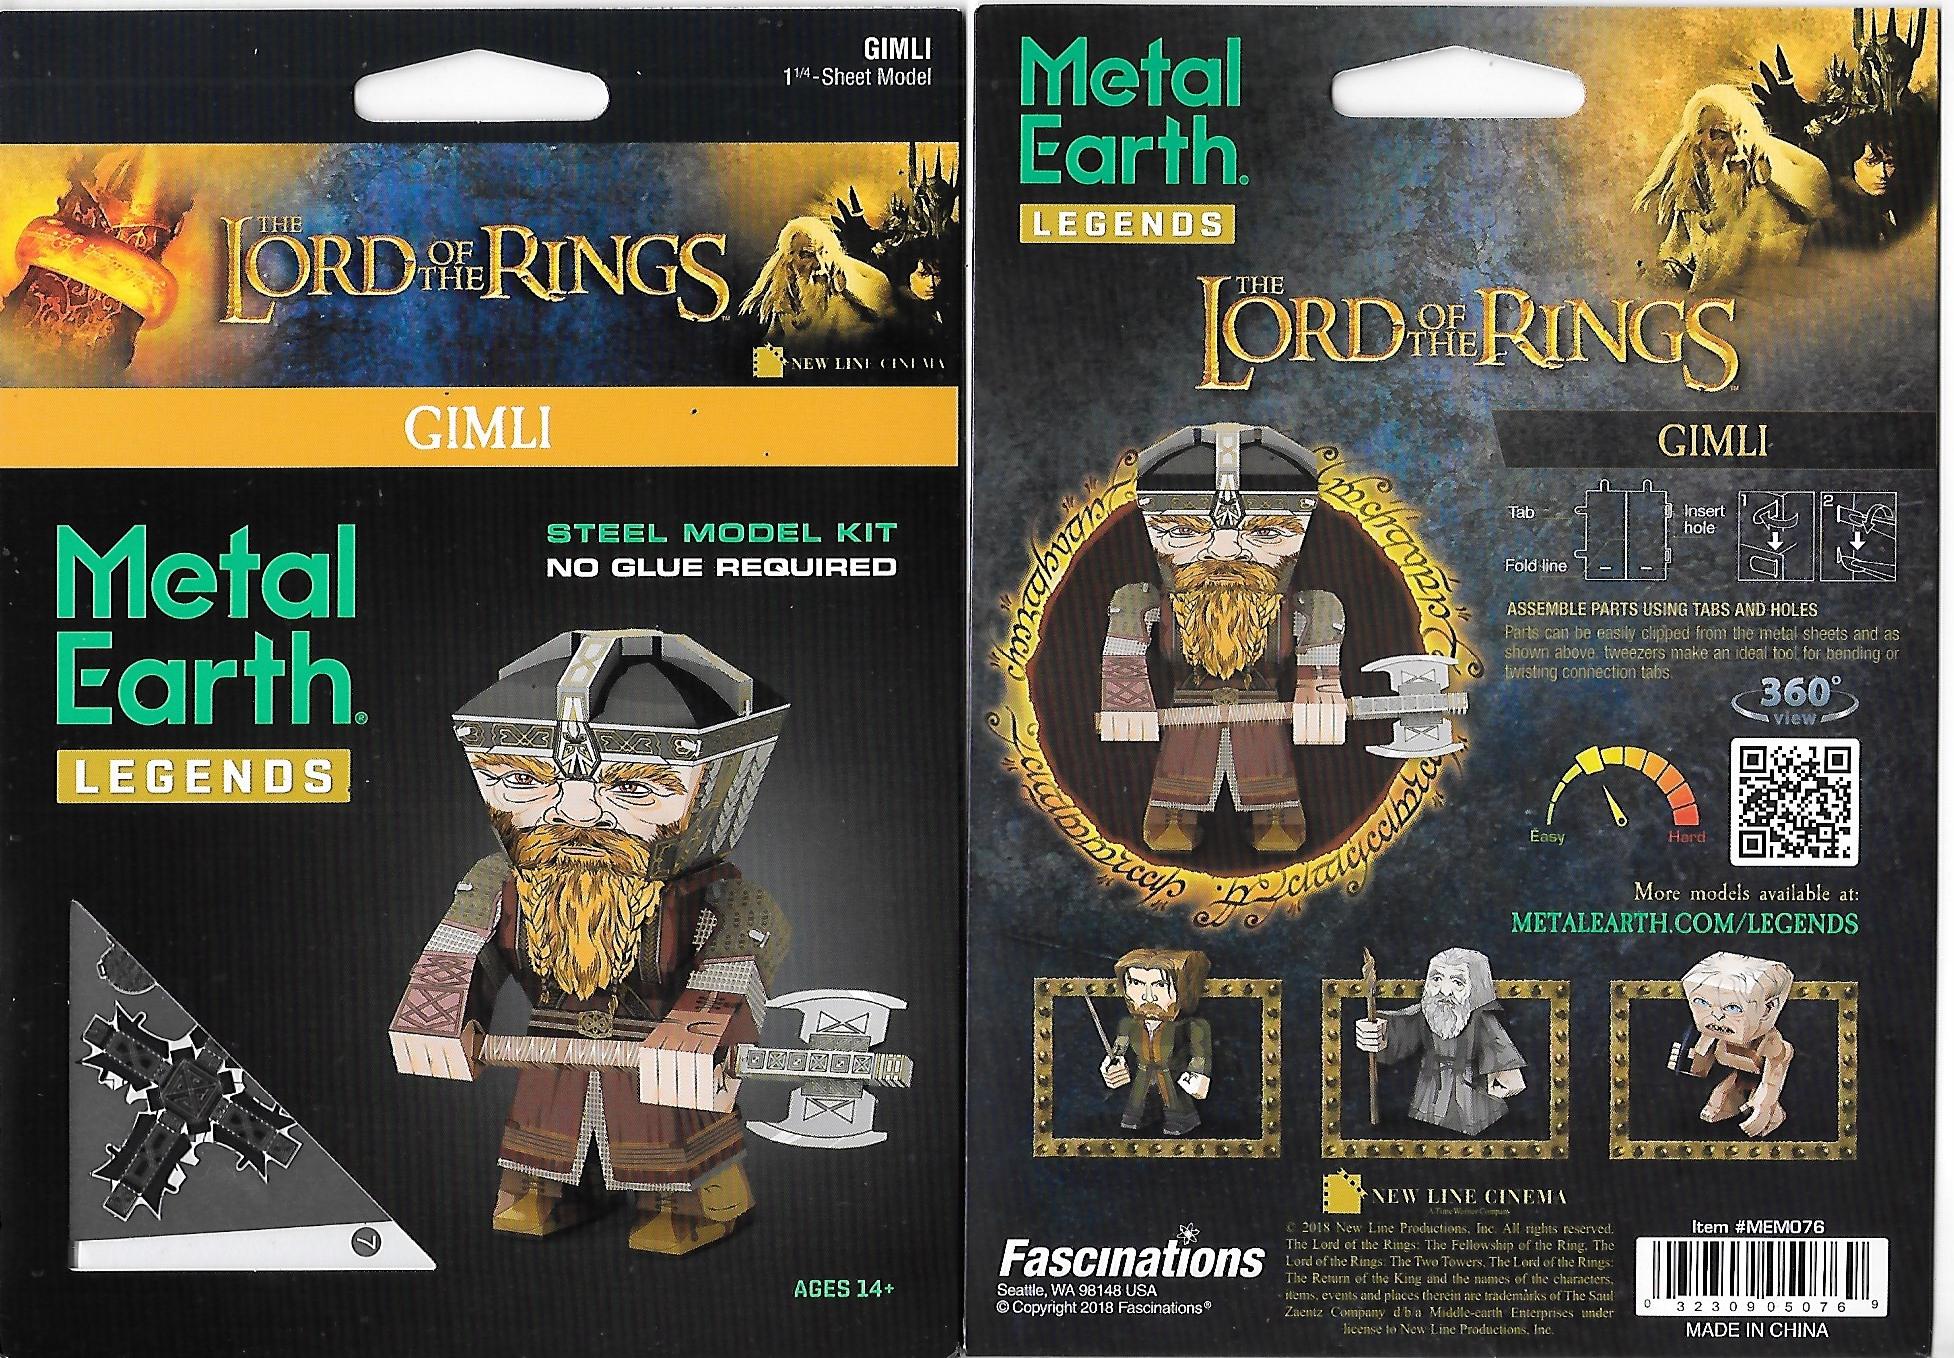 Lord of The Rings Gimli Metal Earth Legends 3-D Laser Cut Steel Model Kit  NEW